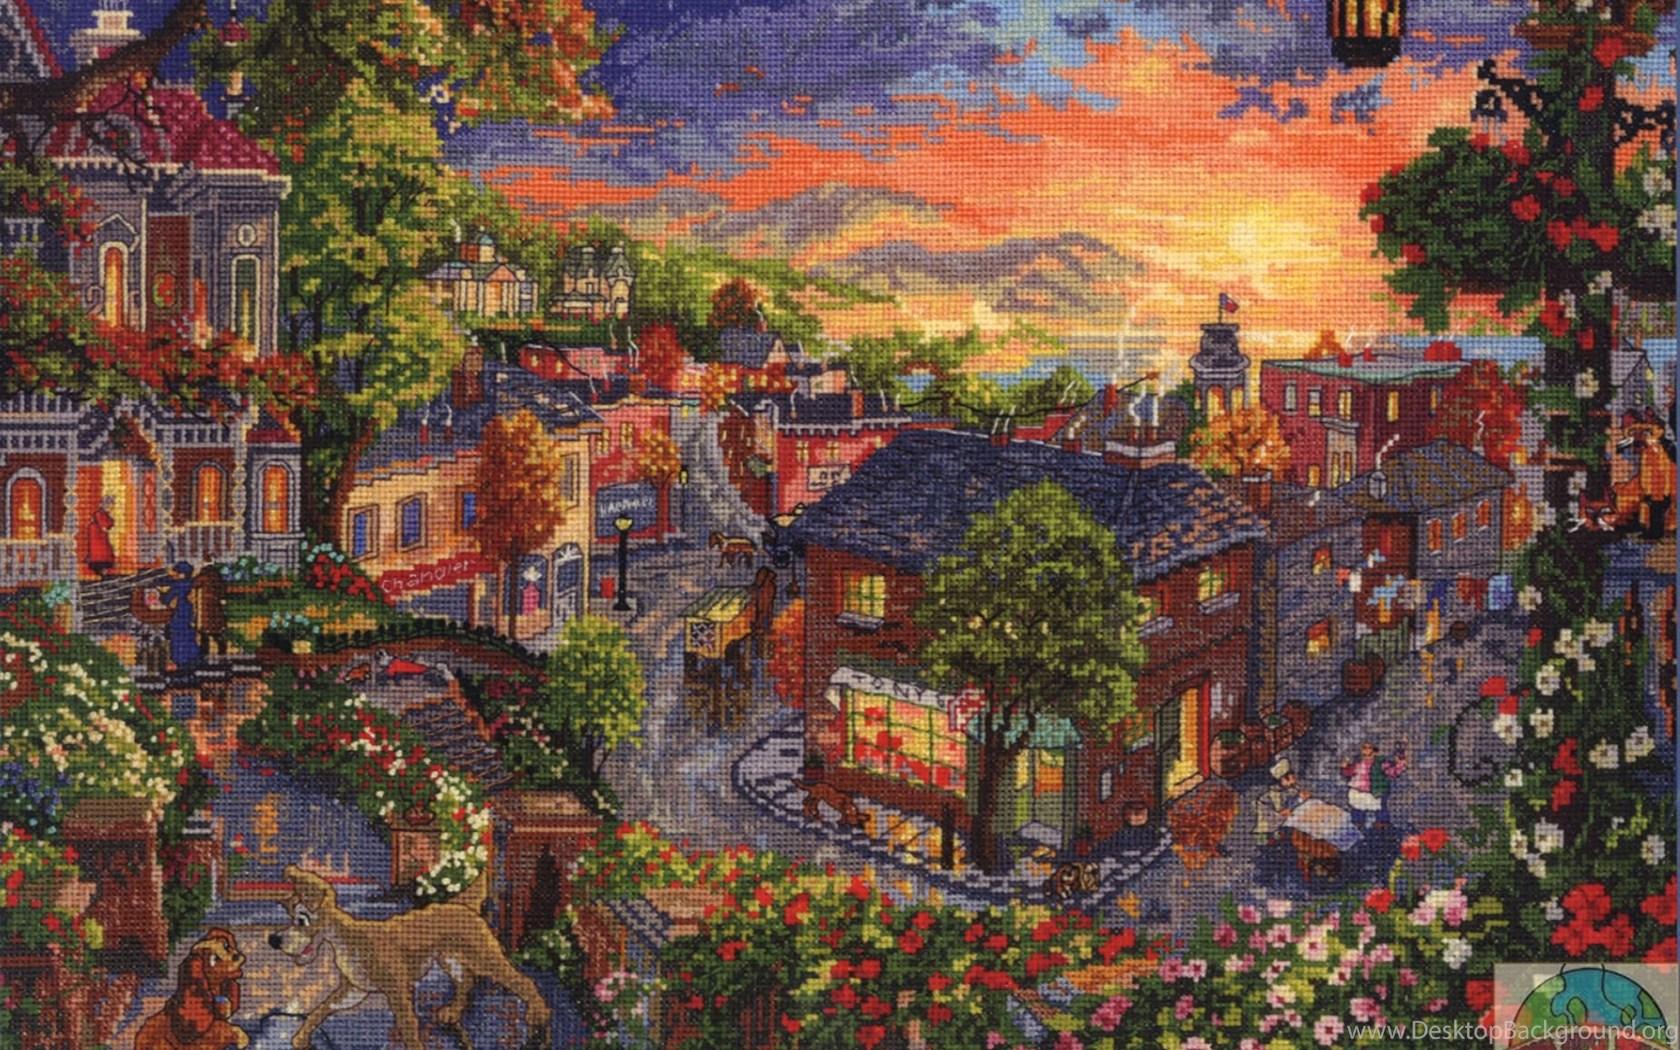 Thomas Kinkade Disney Wallpapers Wallpapers Cave Desktop Background